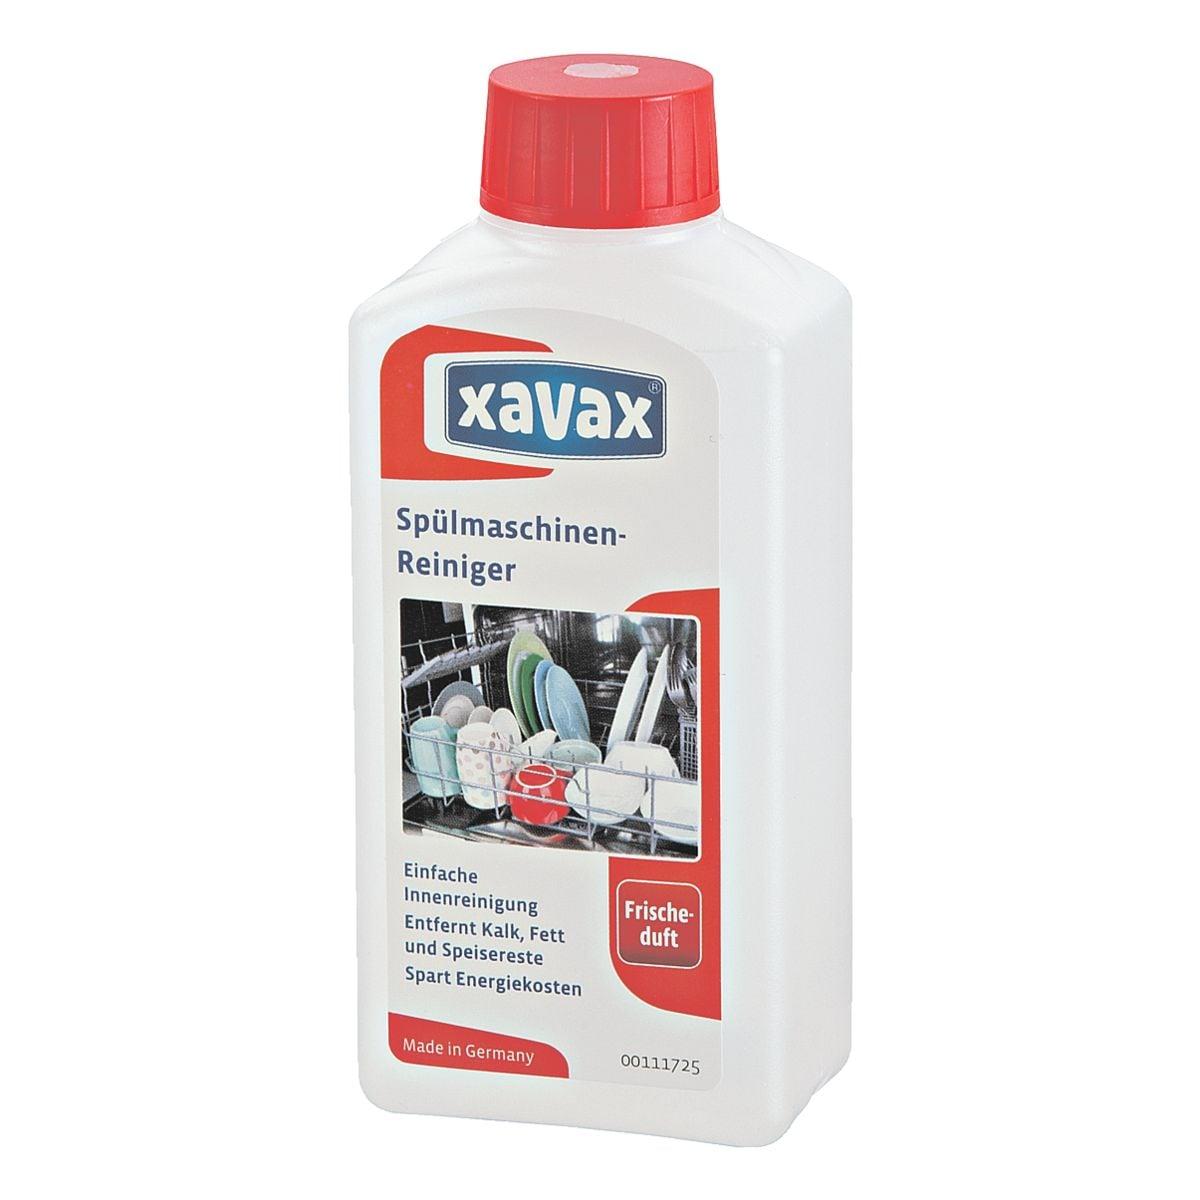 Xavax Spülmaschinenreiniger